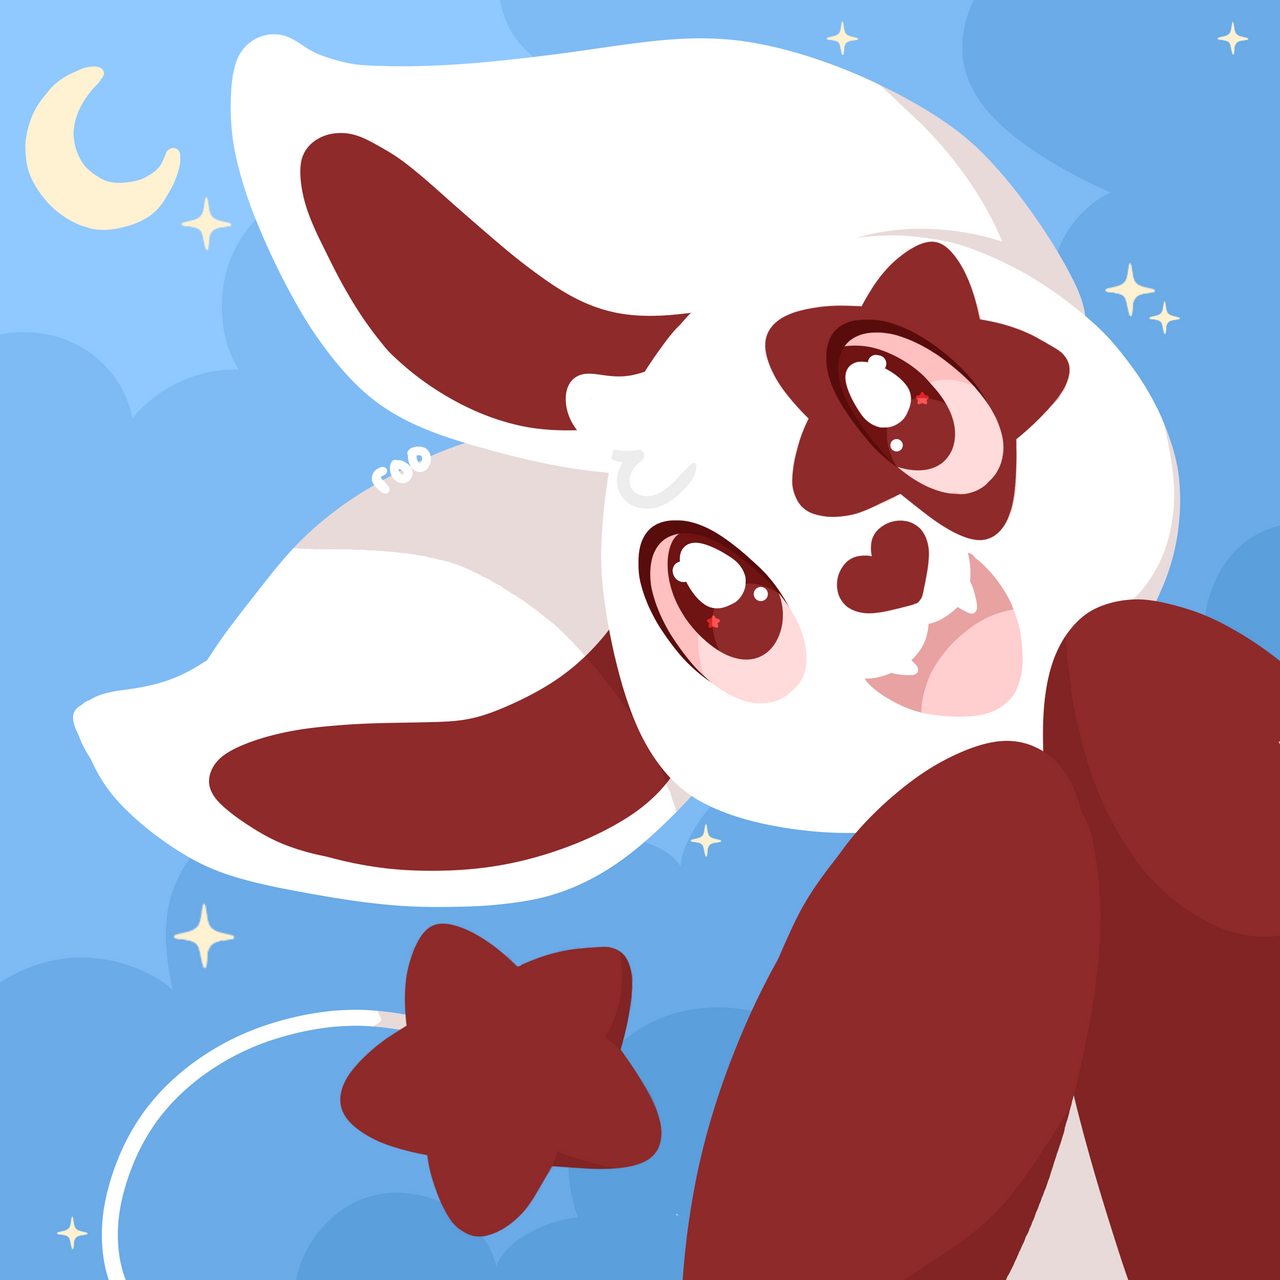 the brightest star [oc]